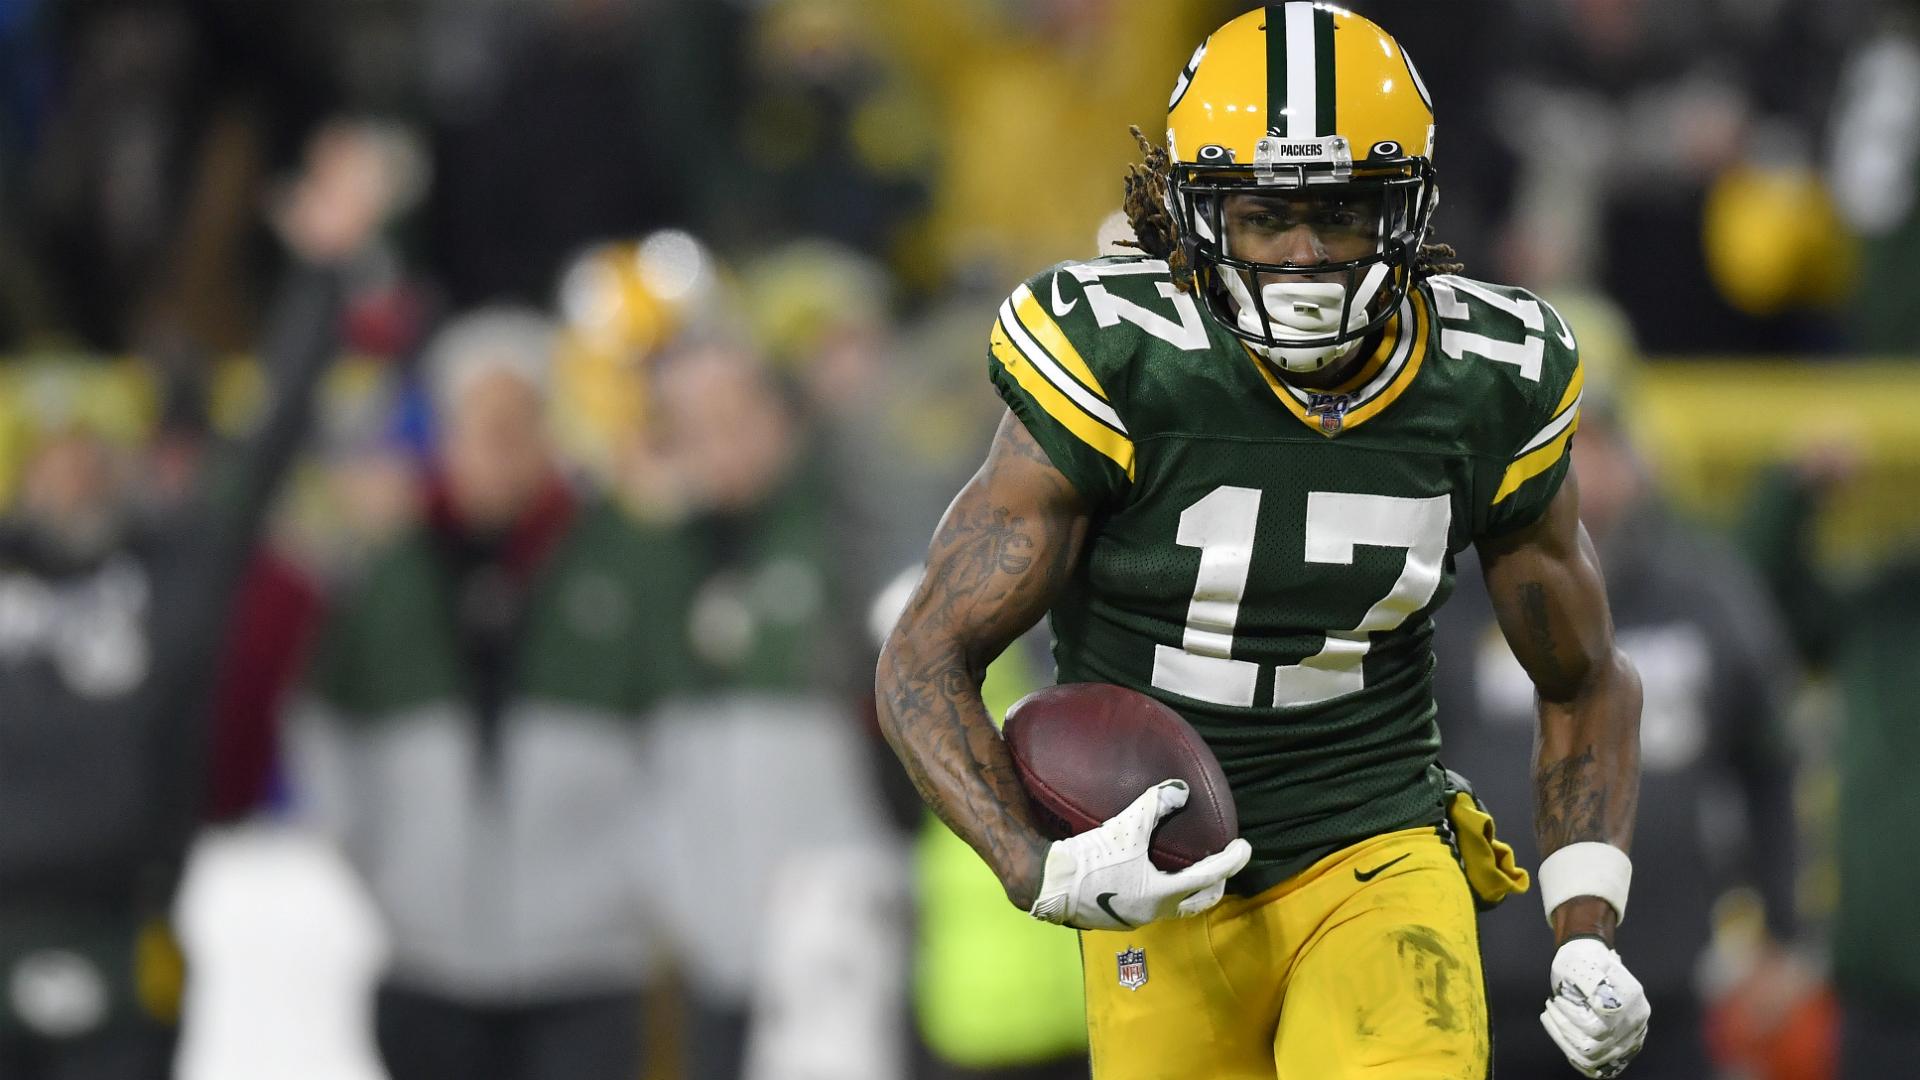 Davante Adams shows in Packers' win over Seahawks that he ...Davante Adams